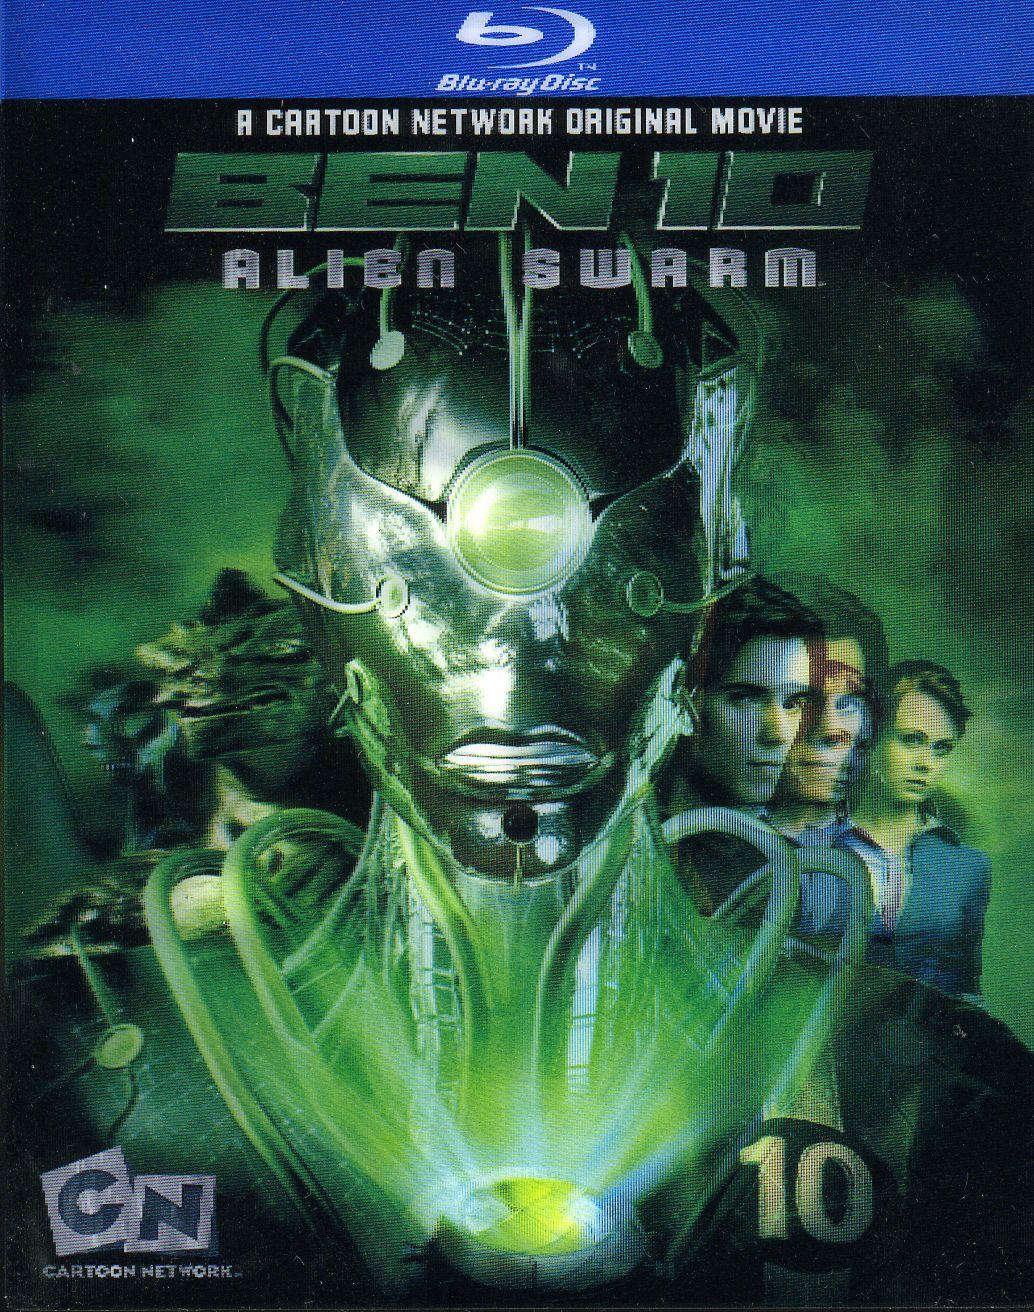 Ben 10: Alien Swarm (Blu-ray Disc)